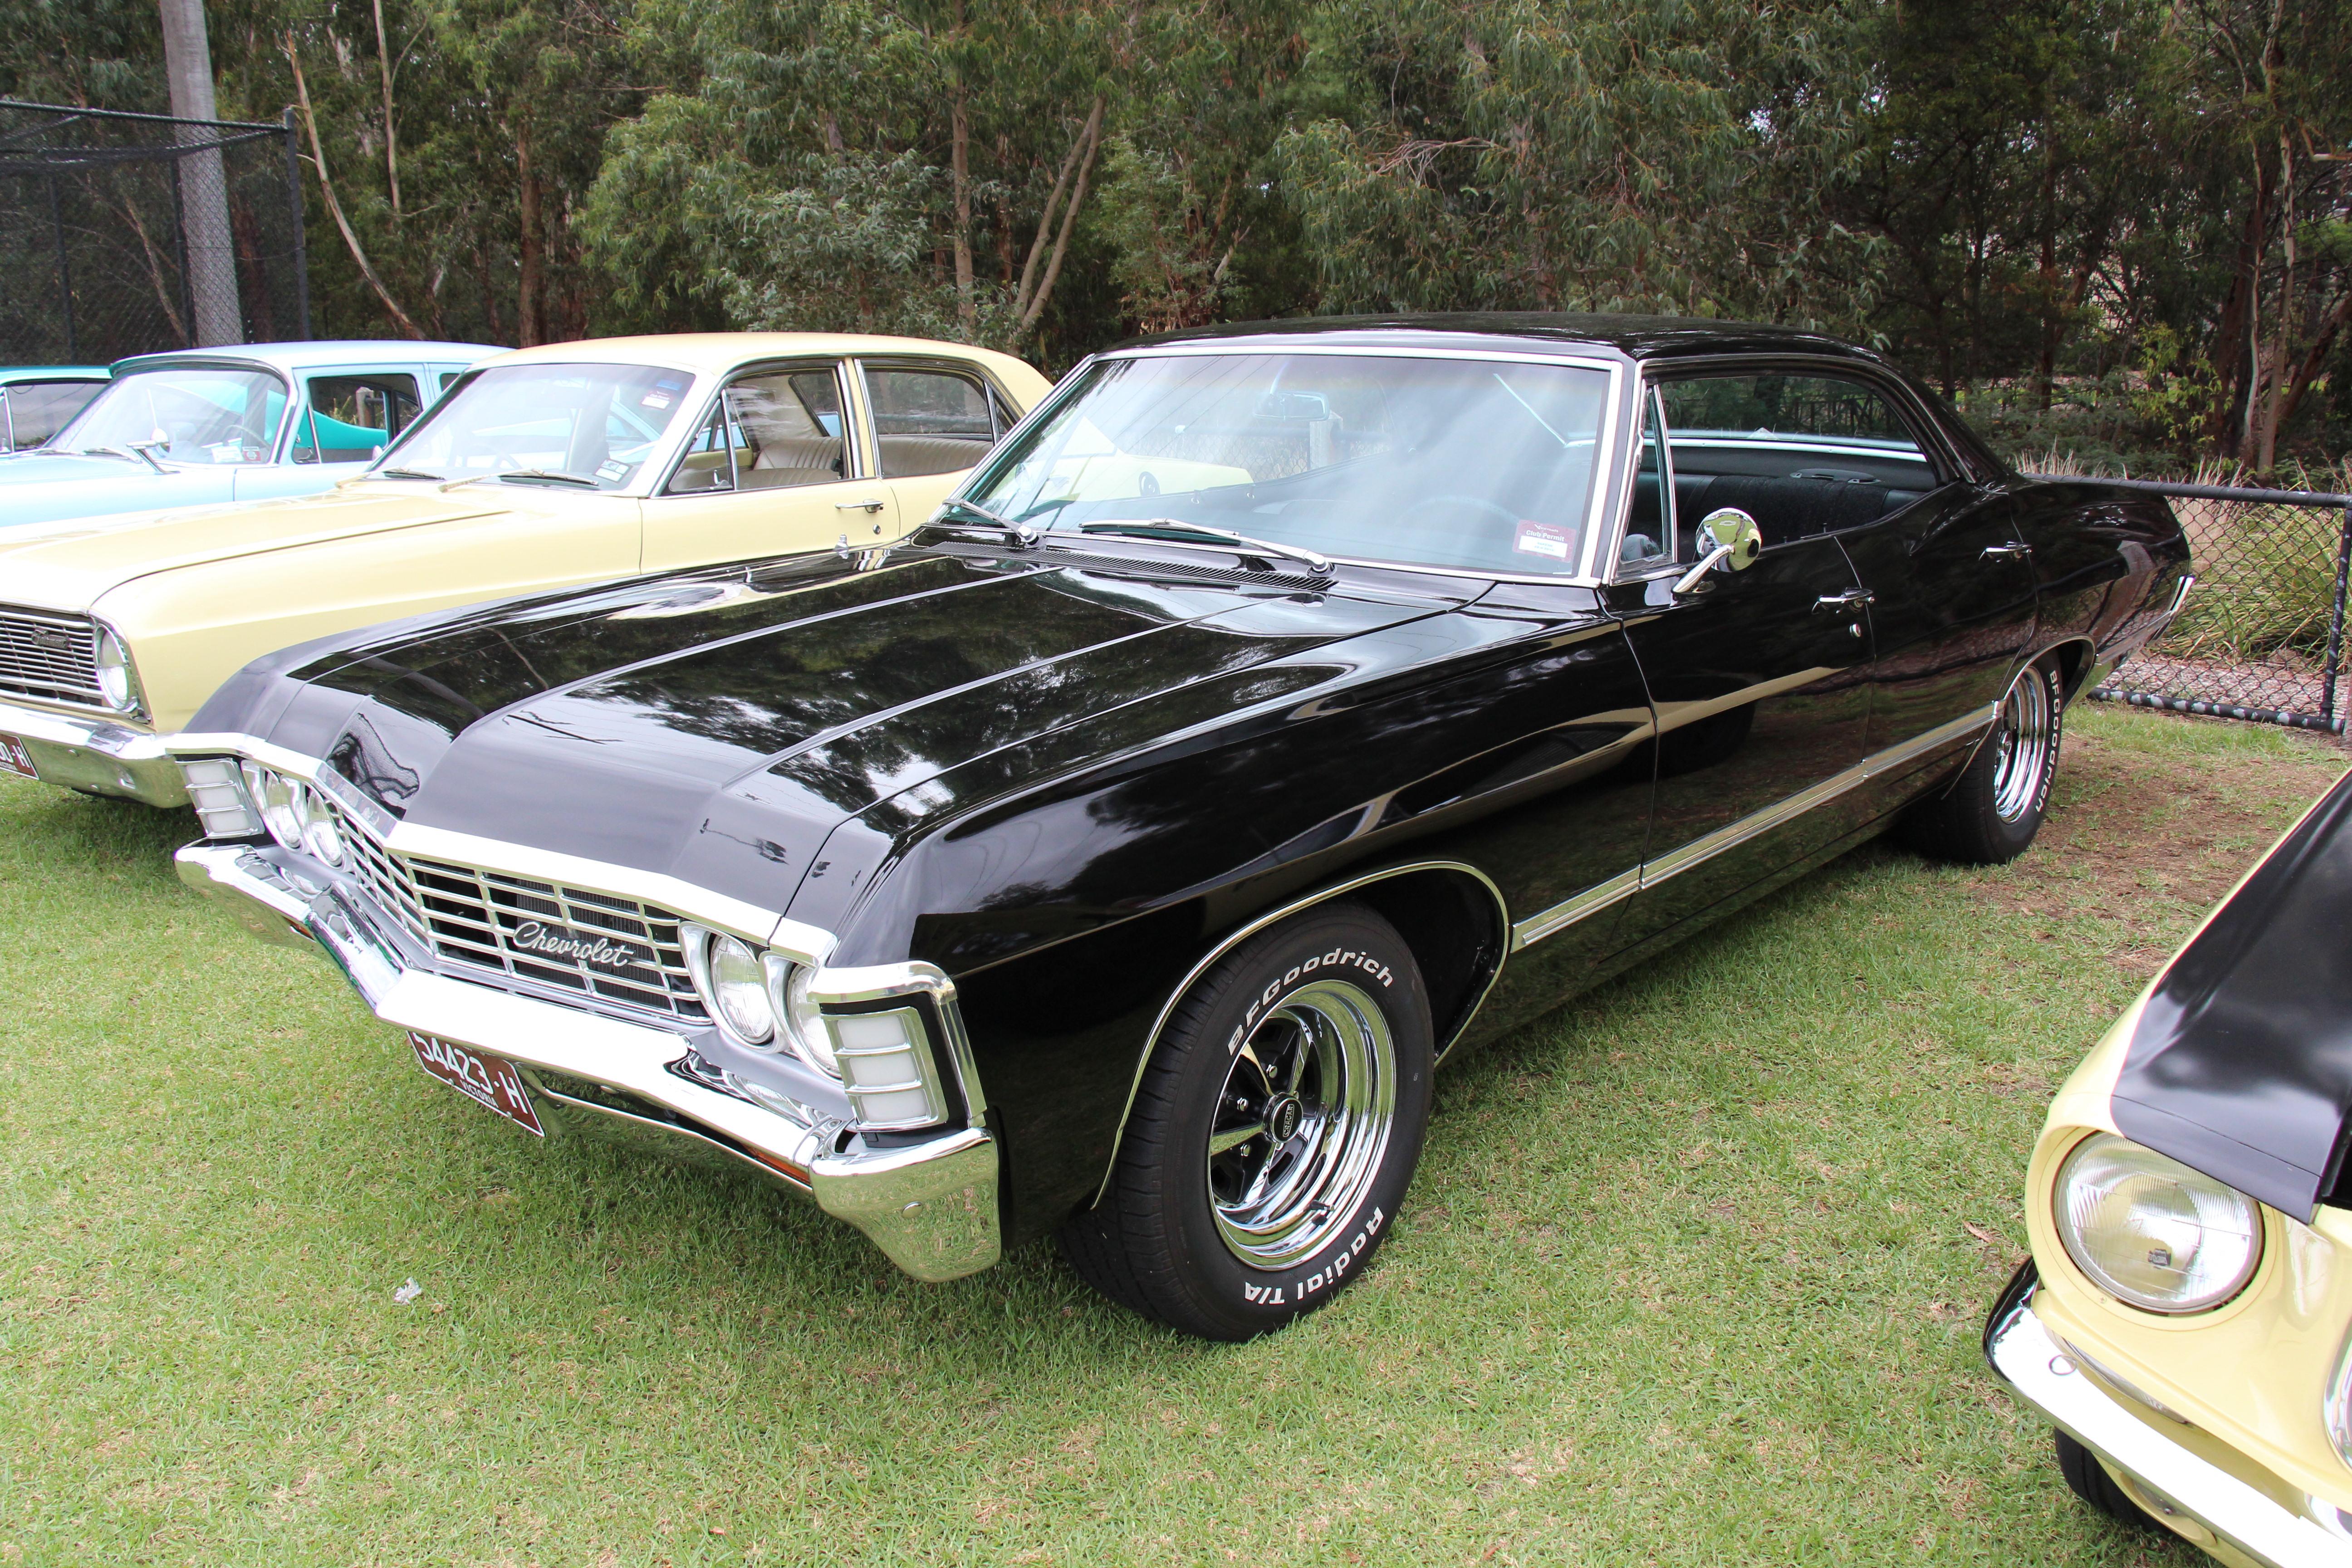 File 1967 Chevrolet Impala 4 Door Hardtop 25588152540 Jpg Wikimedia Commons